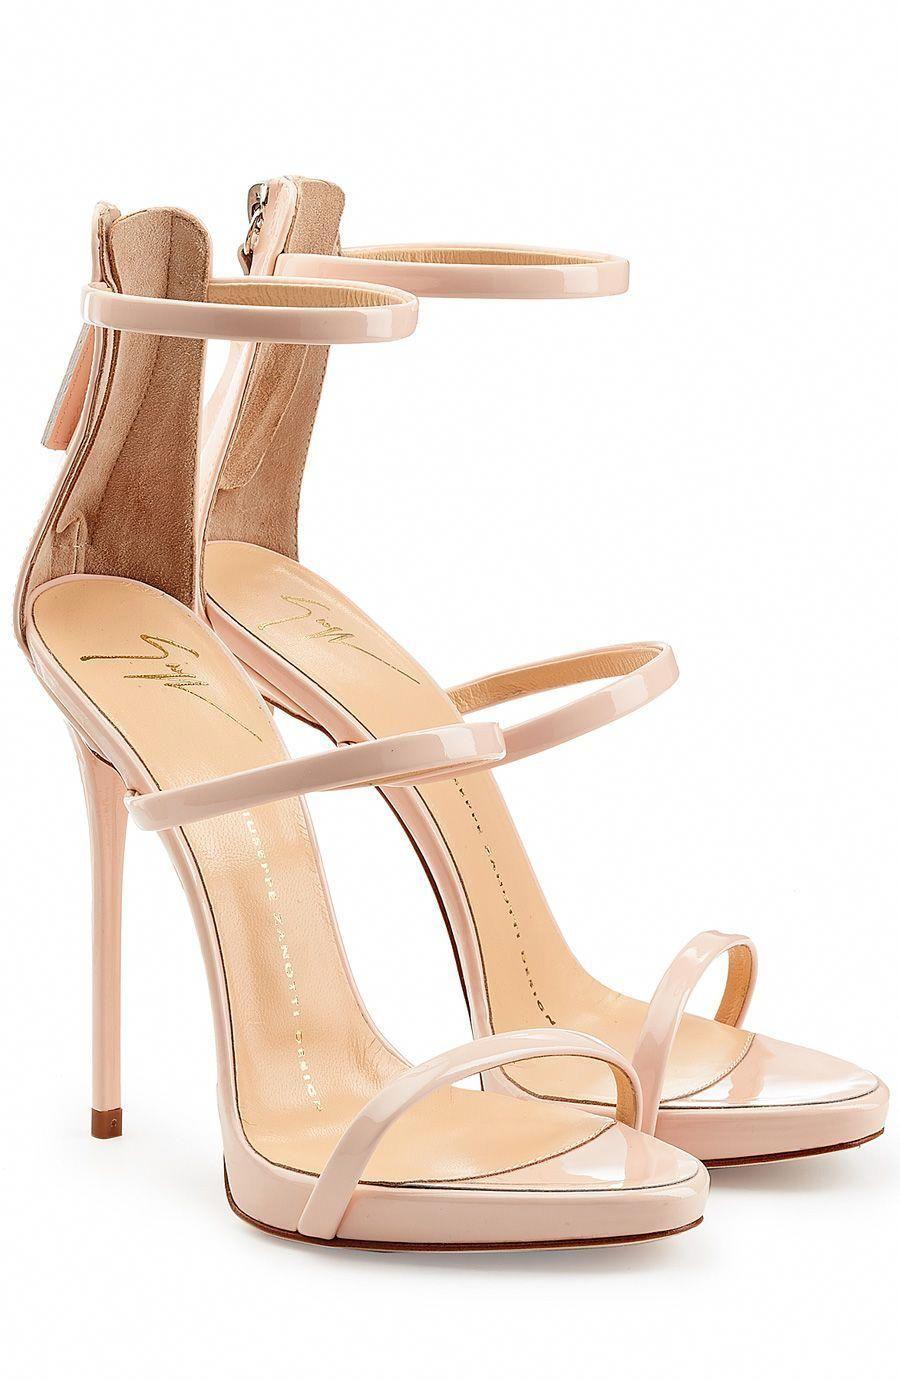 553d8da9373 GIUSEPPE ZANOTTI - Patent Leather Strappy Sandals  STYLEBOP  SandalsHeels   GiuseppezanottiHeels